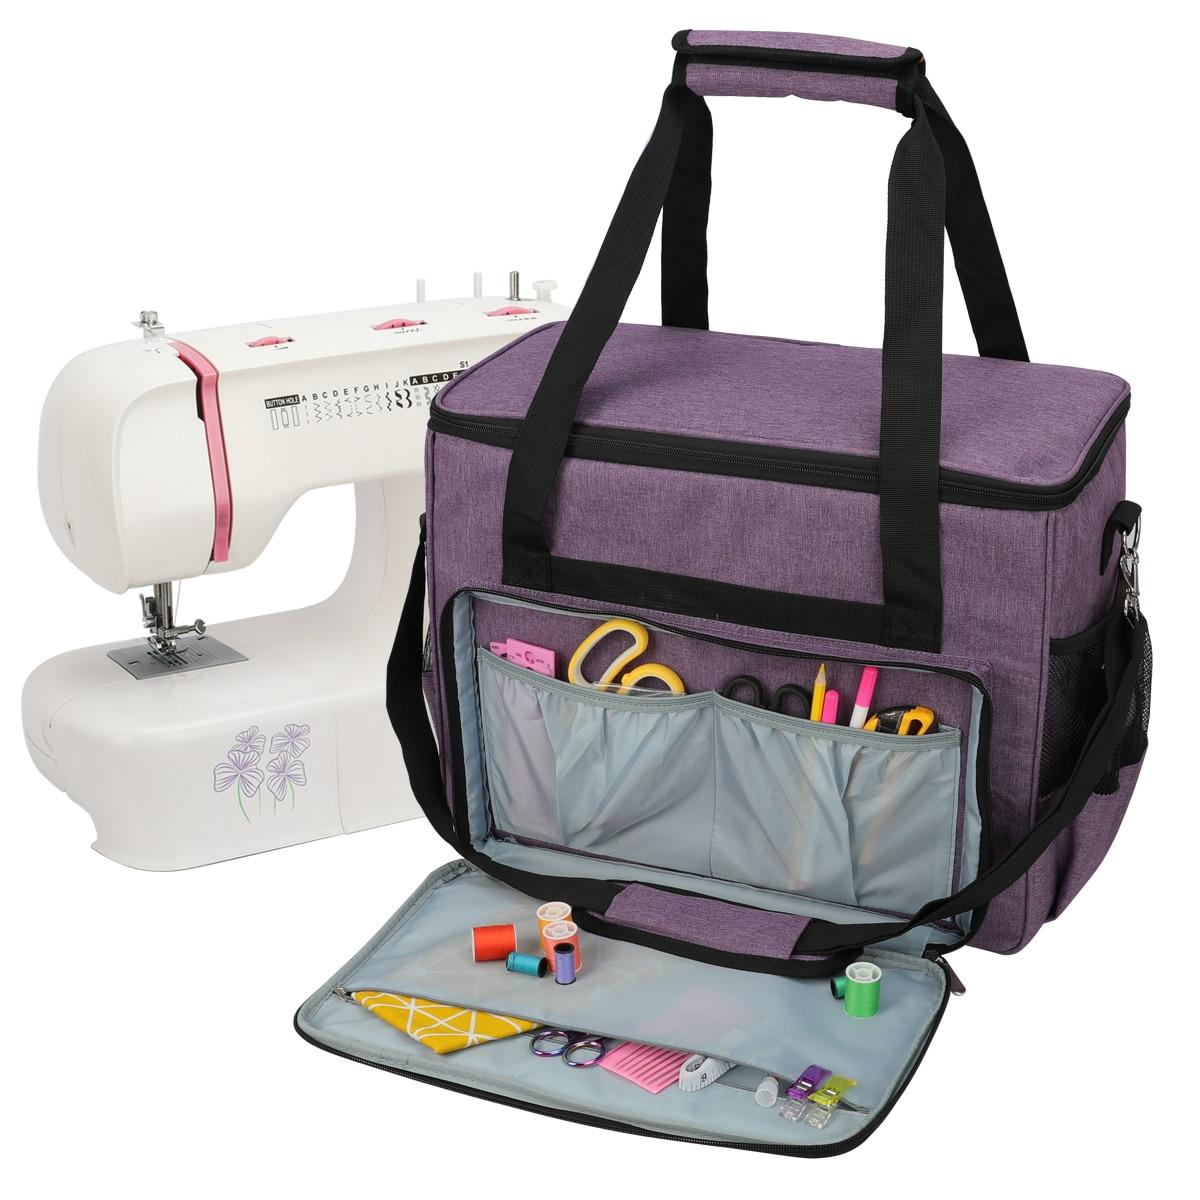 Knitting Bag Large Capacity Sewing Machine Storage Bag Wool Crochet Hook Knitting Needle Sewing Supplies Set Household Organizer